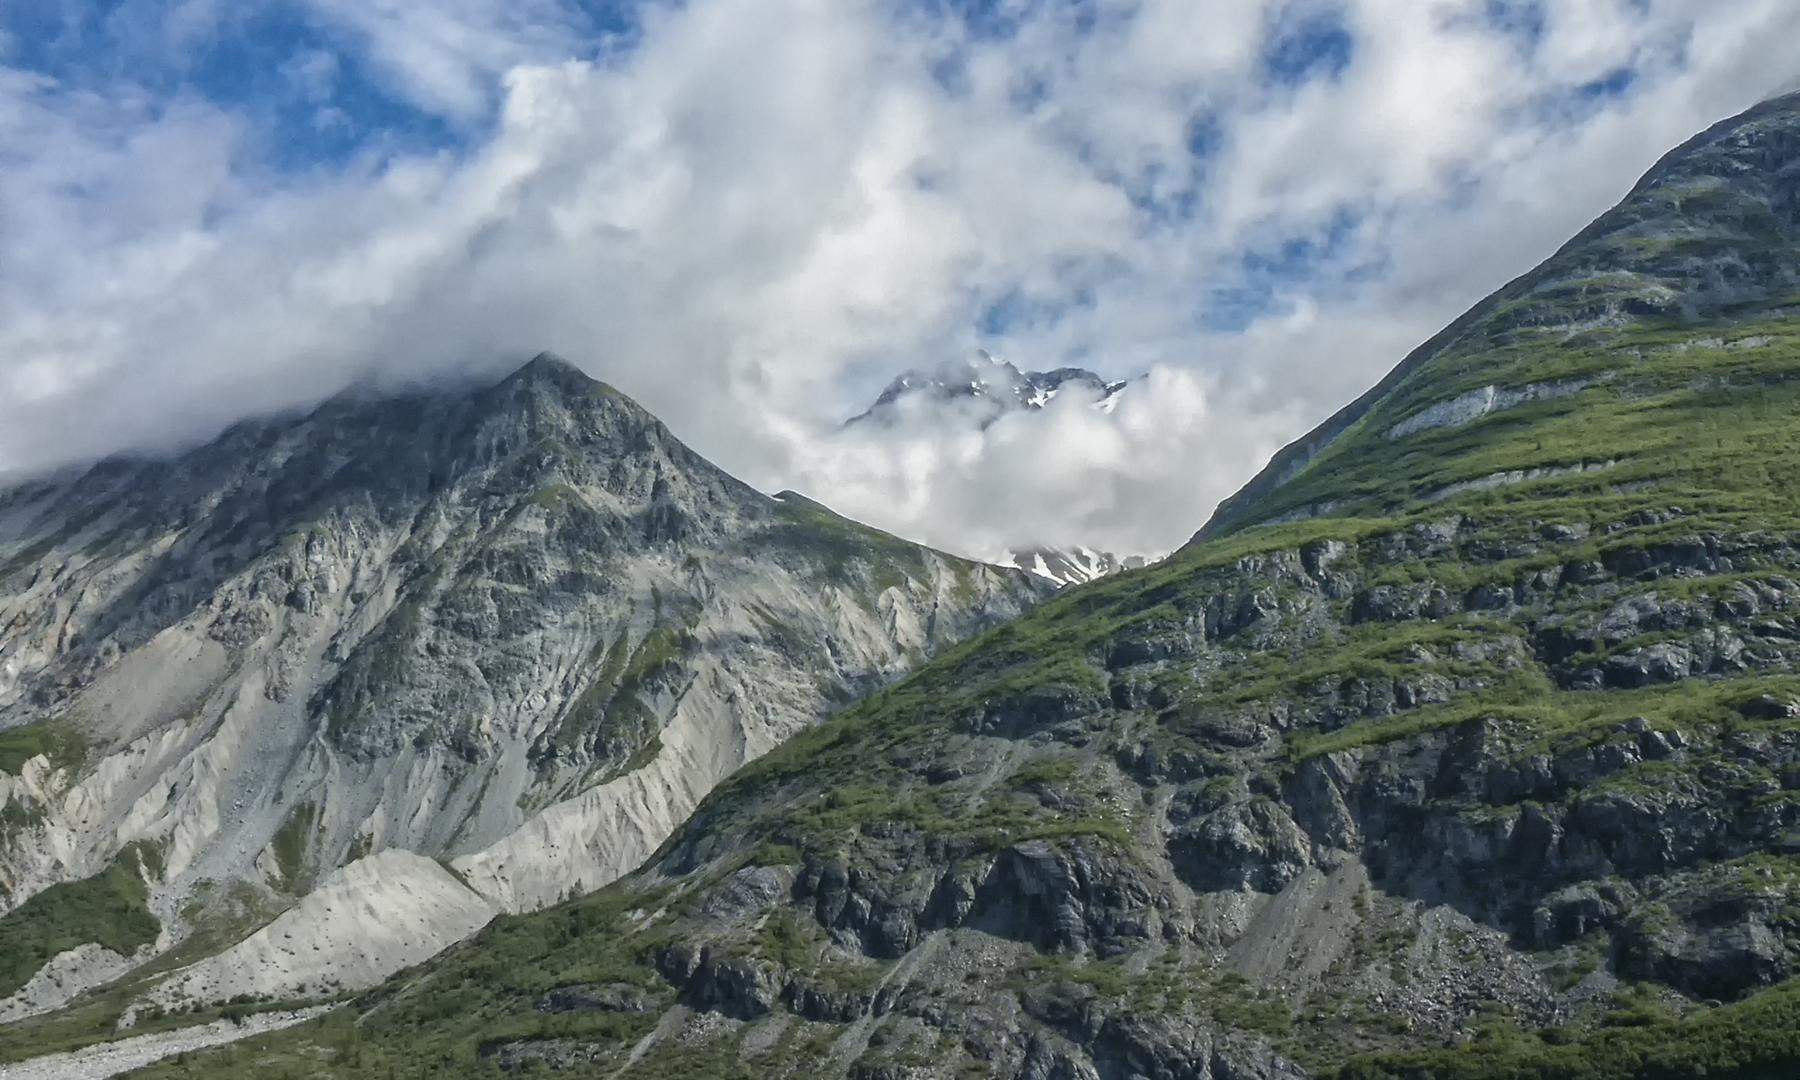 Hilary Ottley – Cloud Covered Peaks – HM